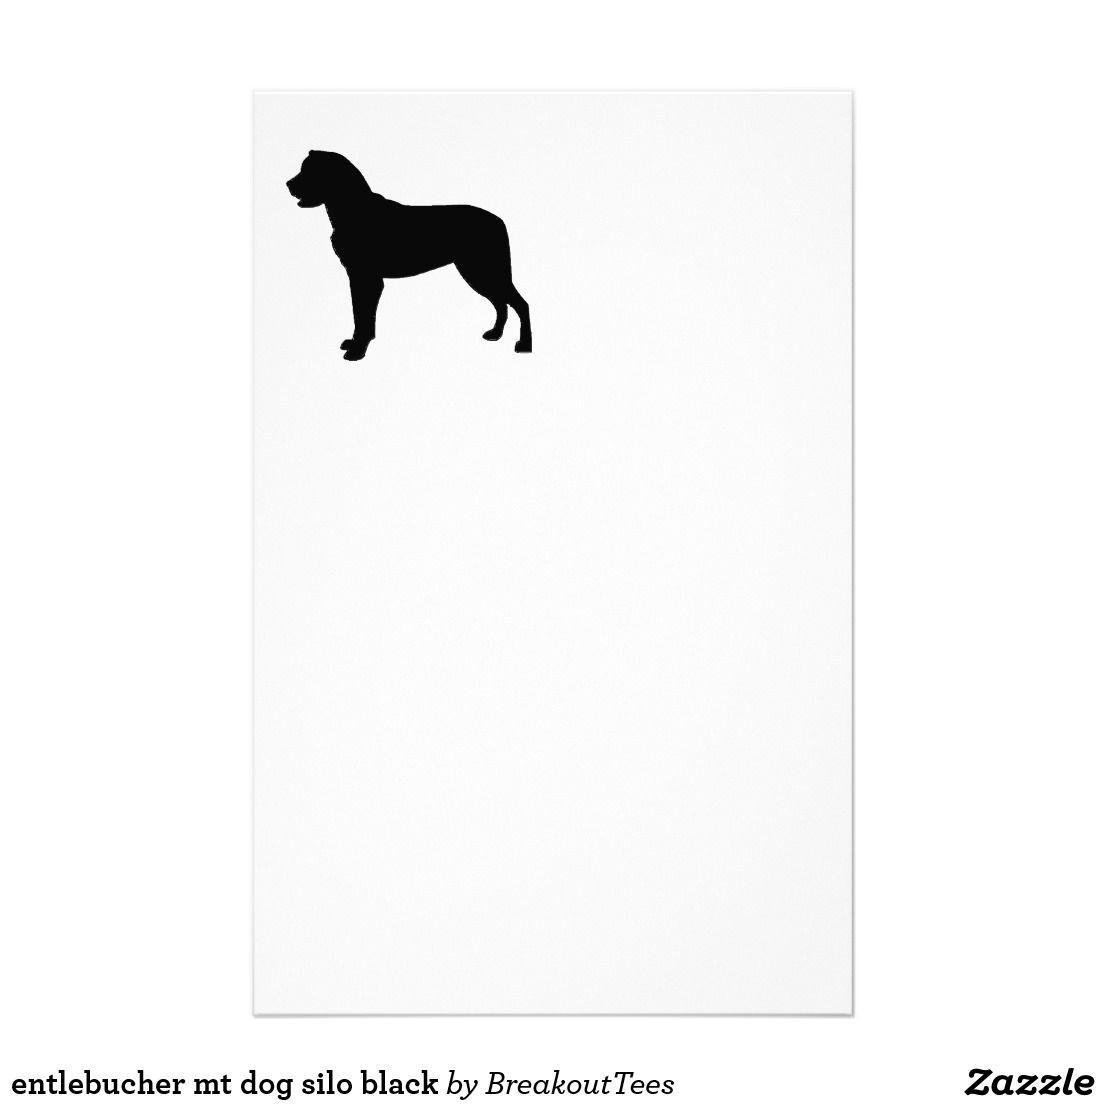 entlebucher mt dog silo black stationery | Zazzle.com ...